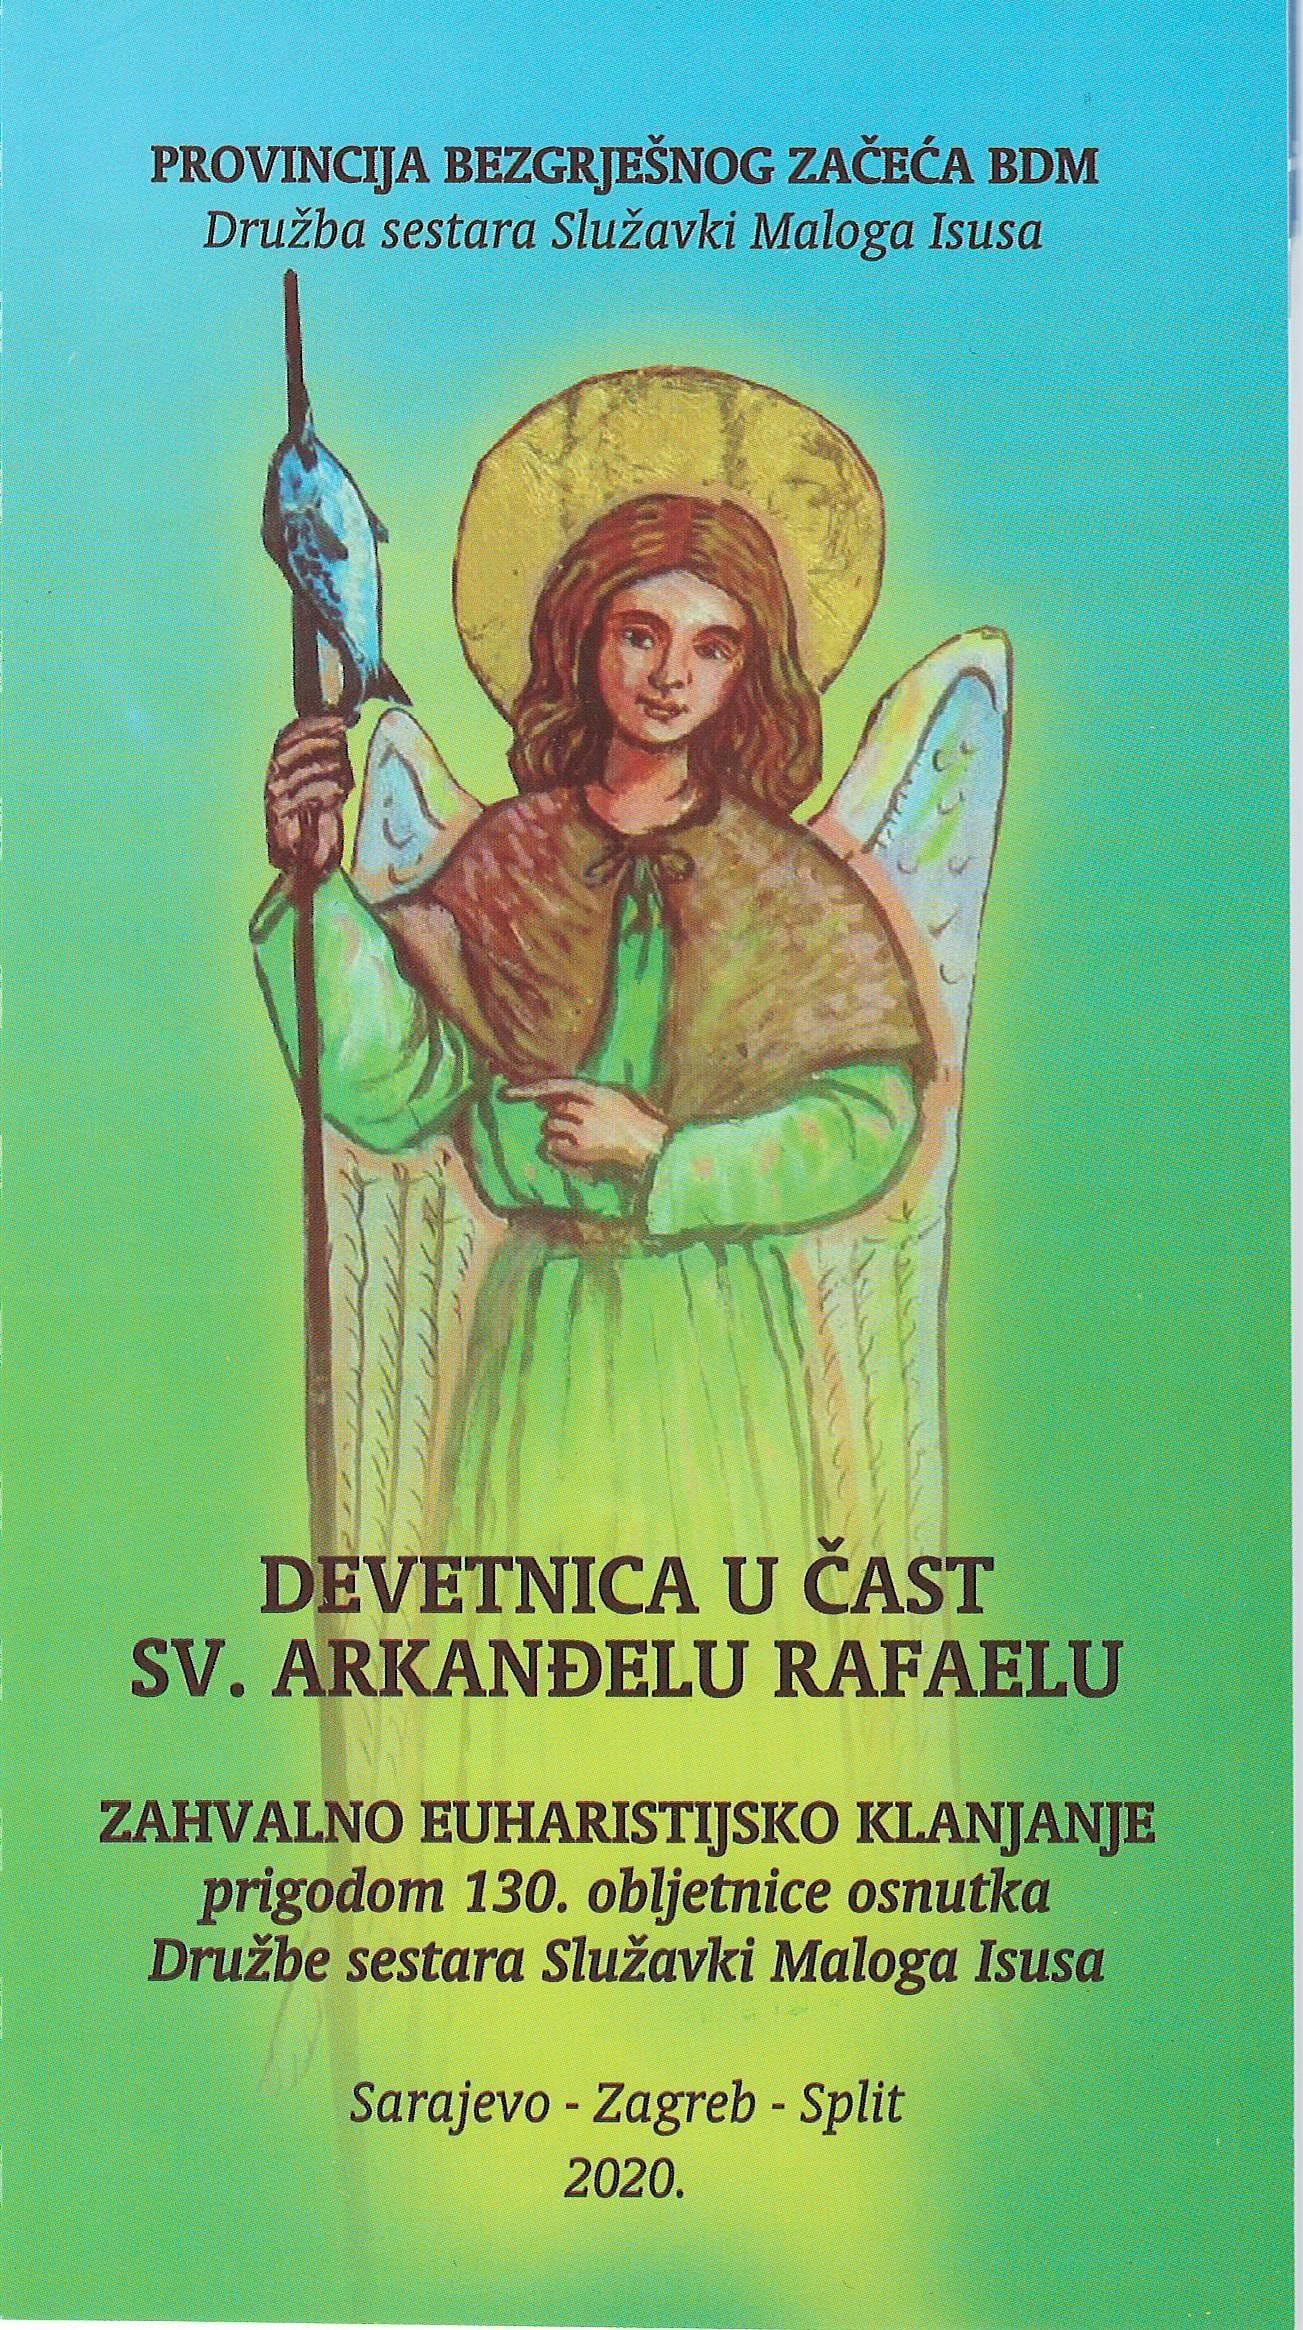 Devetnica u čast sv. Arkanđelu Rafaelu